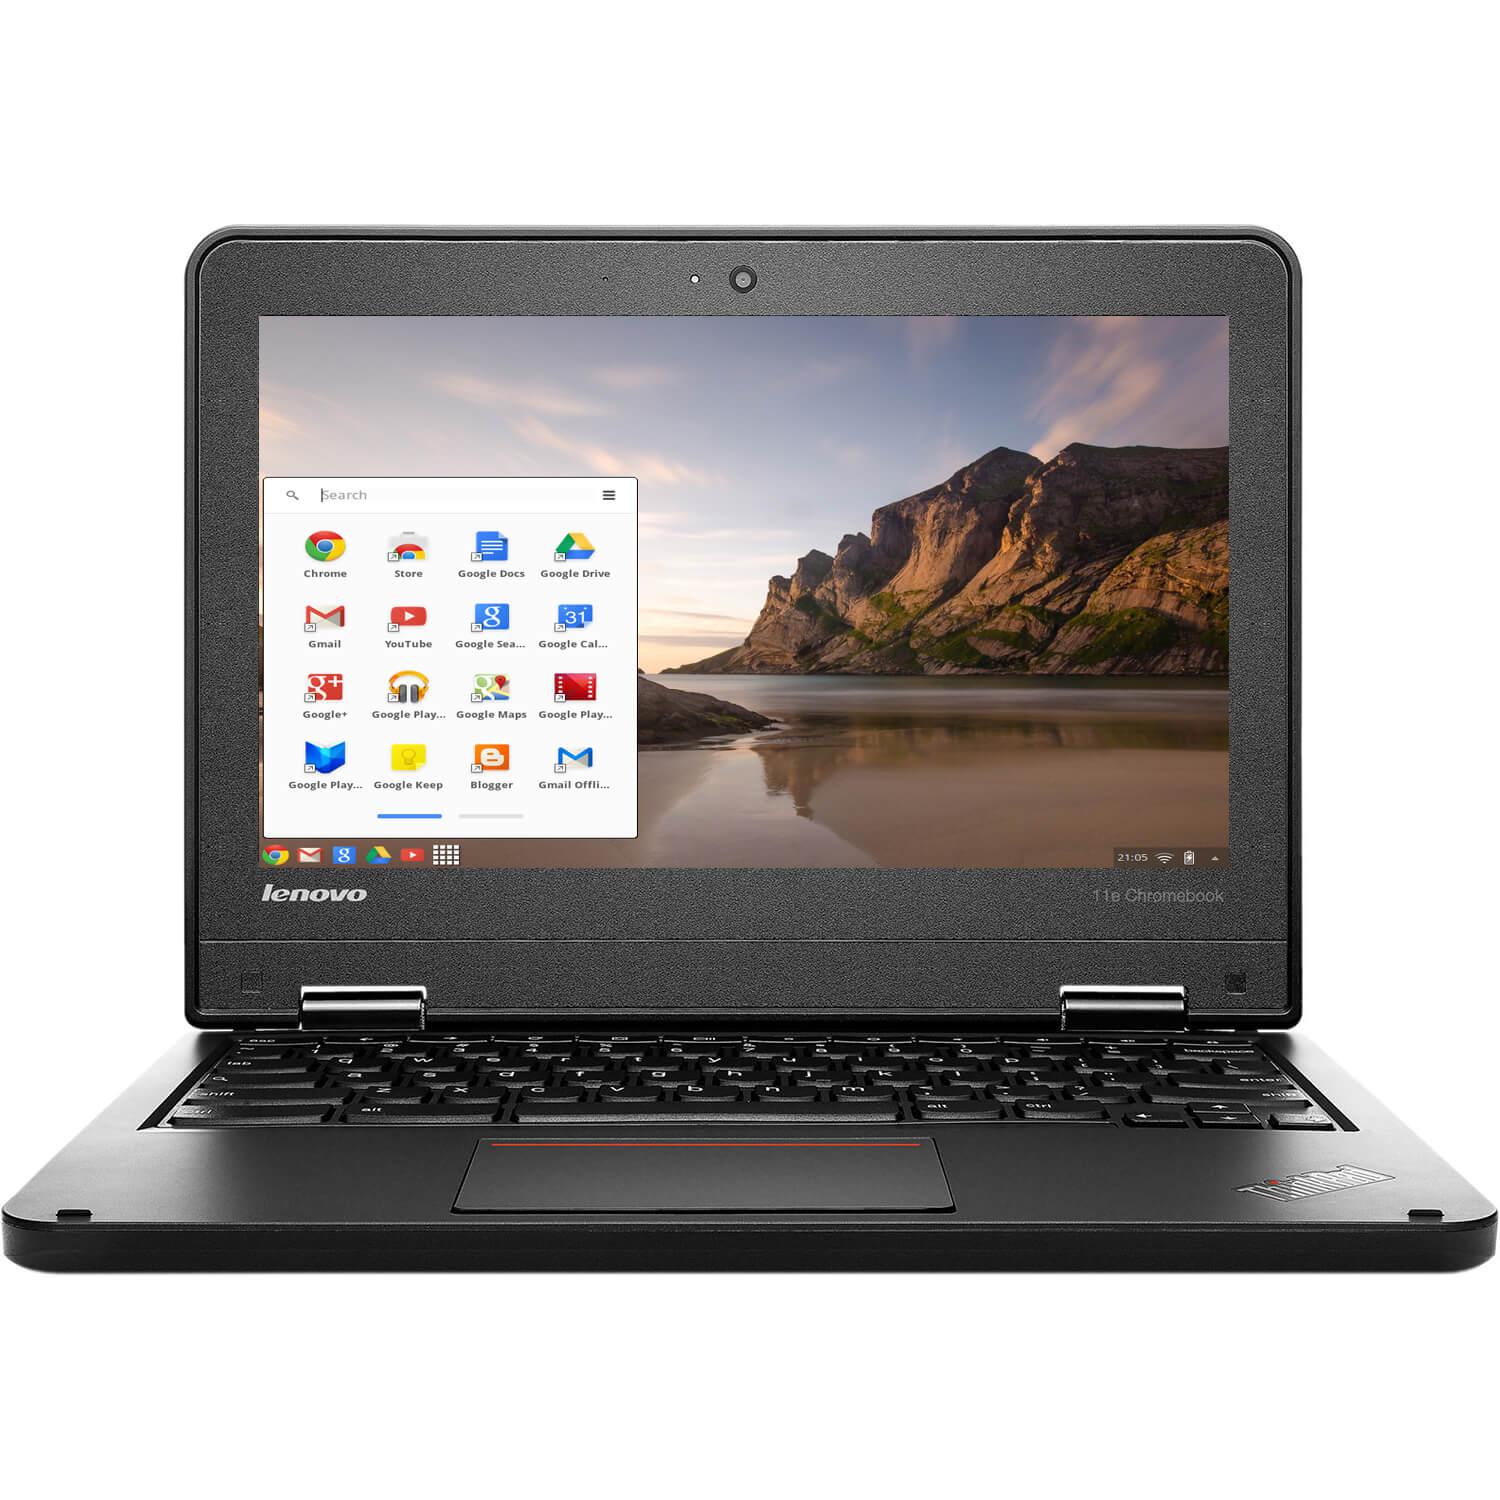 "Lenovo ThinkPad 11.6"" Chromebook Laptop Intel Celeron Quad Core 1.83GHz 16GB 4GB 0"